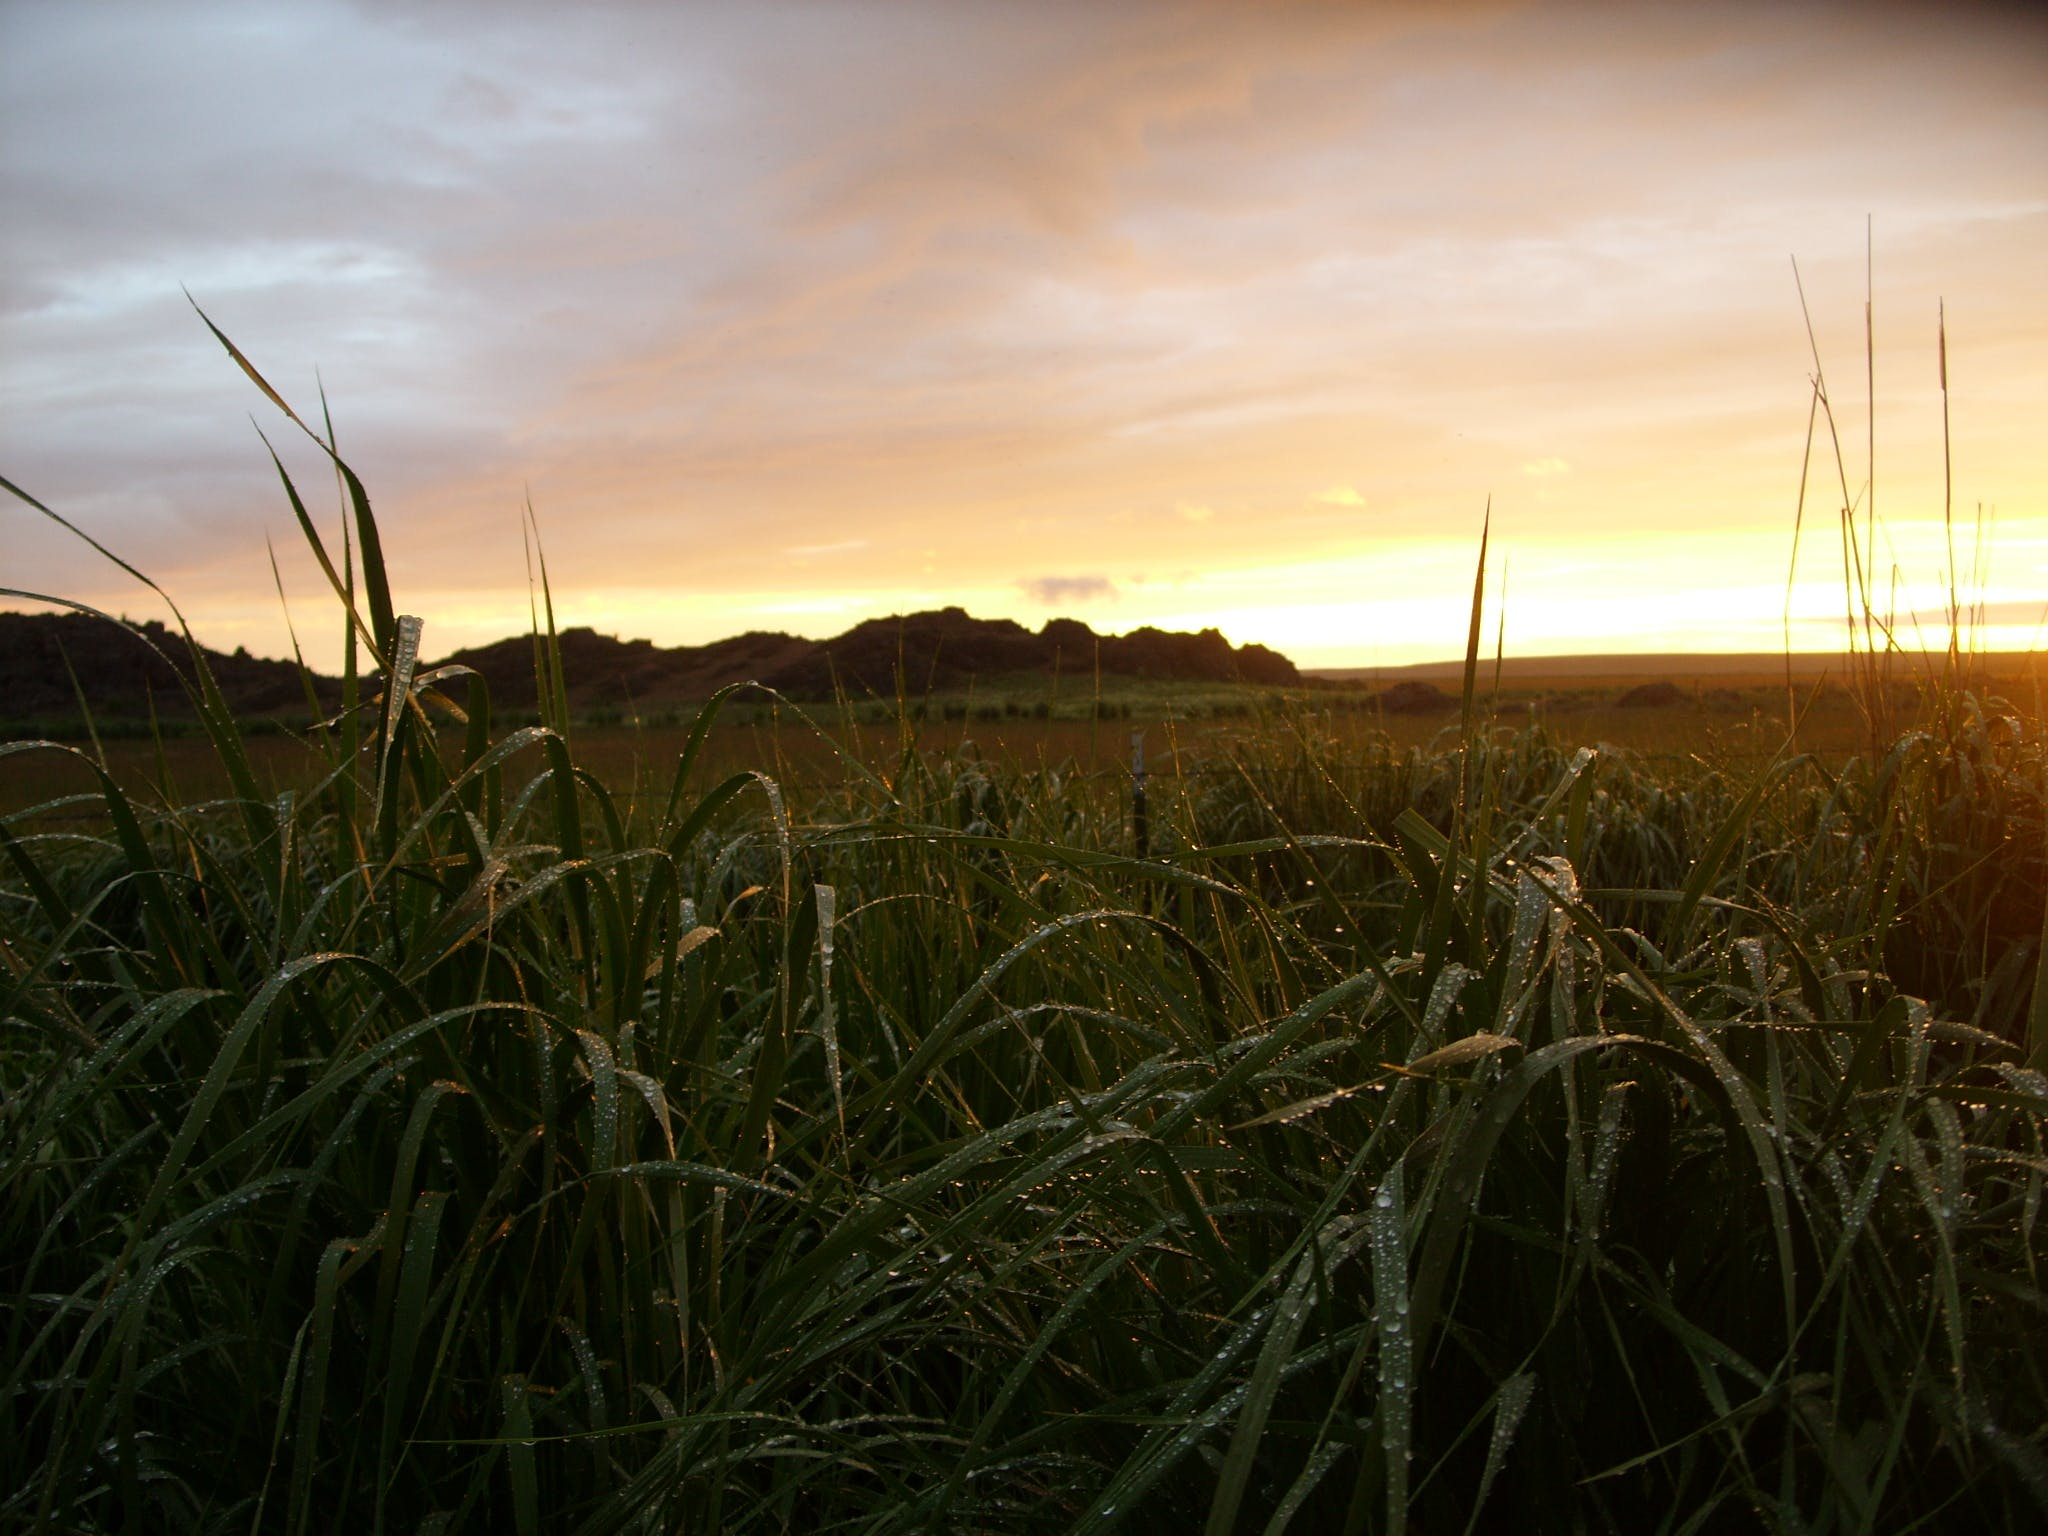 Free stock photo of Eastern Oregon, Joe Leineweber, Jordan Valley, Rural sunset